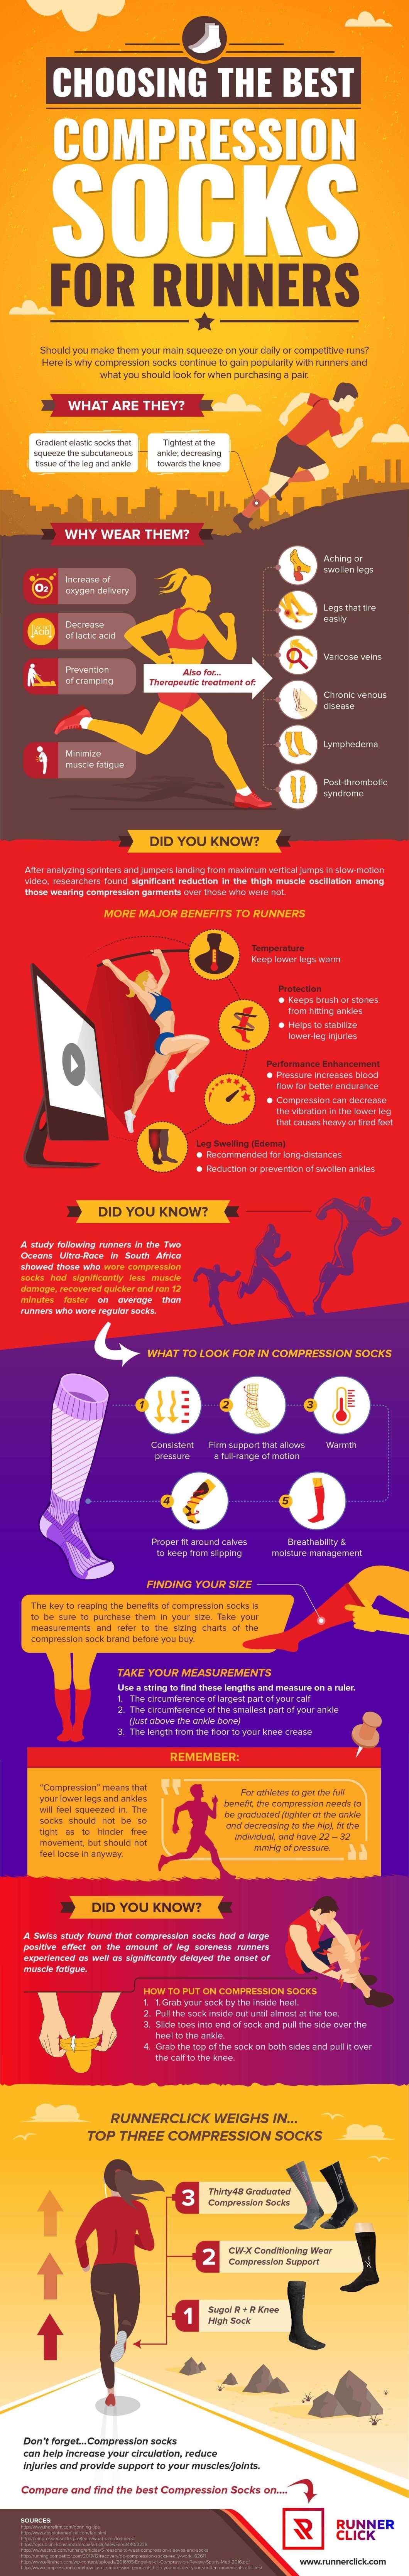 Benefits Of Compression Socks - Infographic